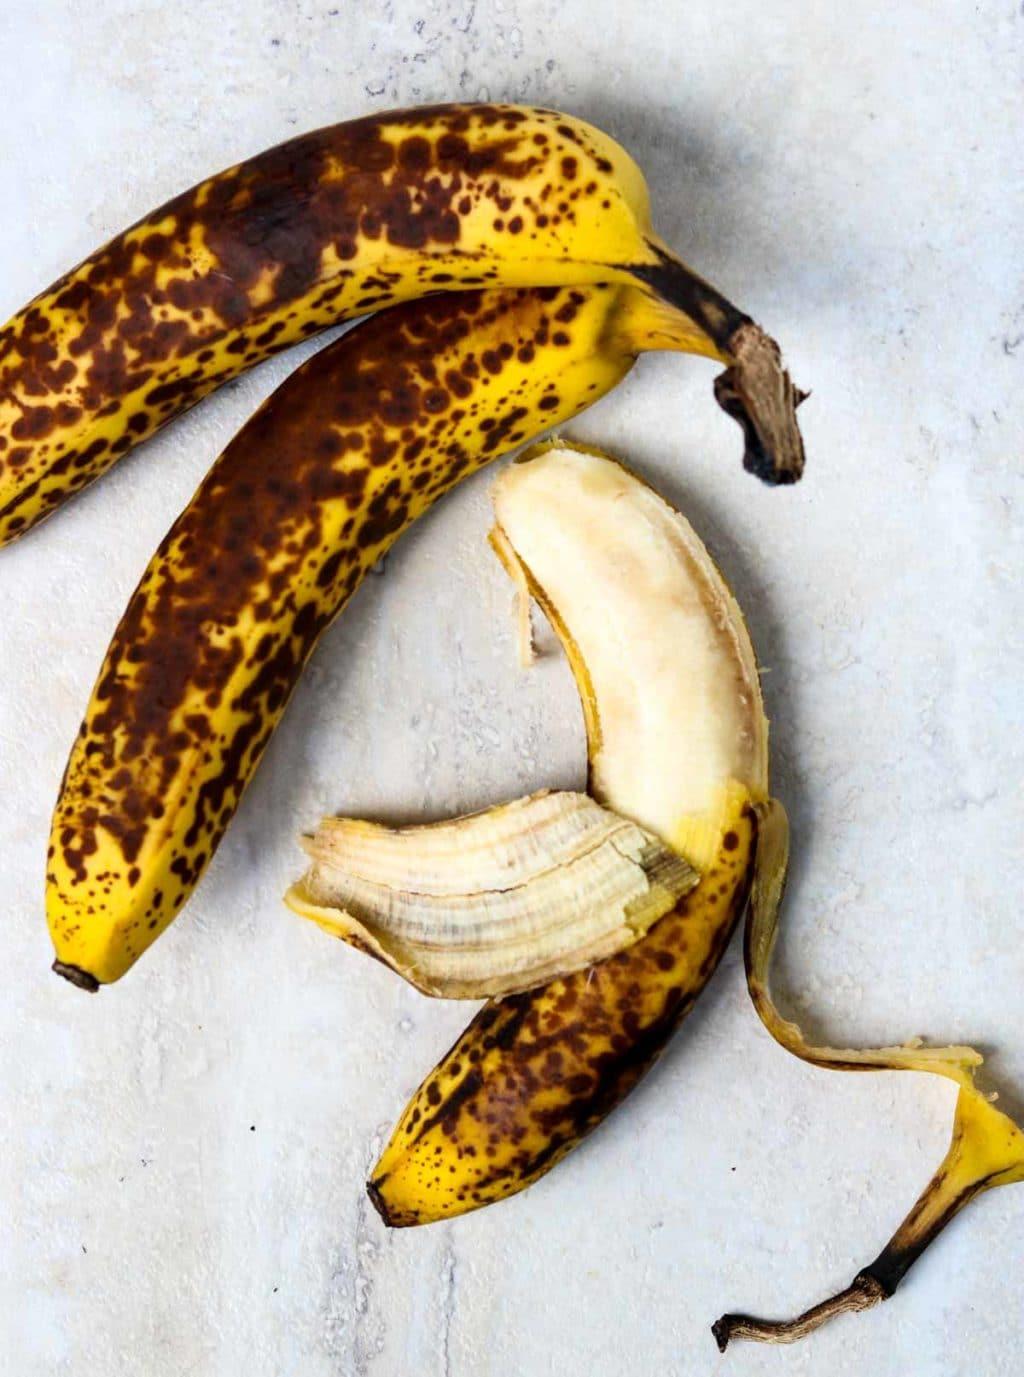 3 over-ripe bananas, one is half peeled